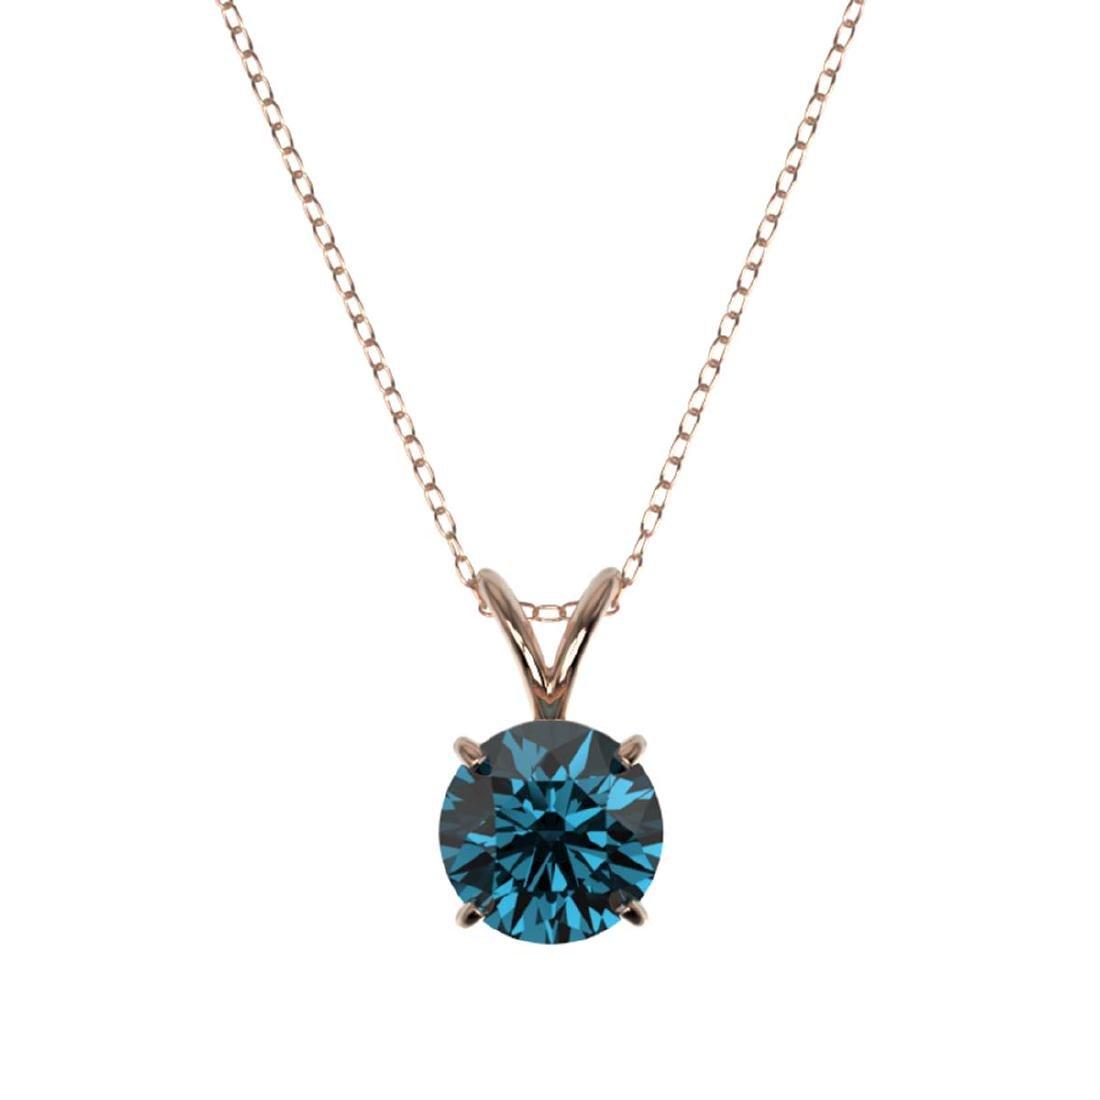 1.28 CTW Intense Blue SI Diamond Solitaire Necklace - 3